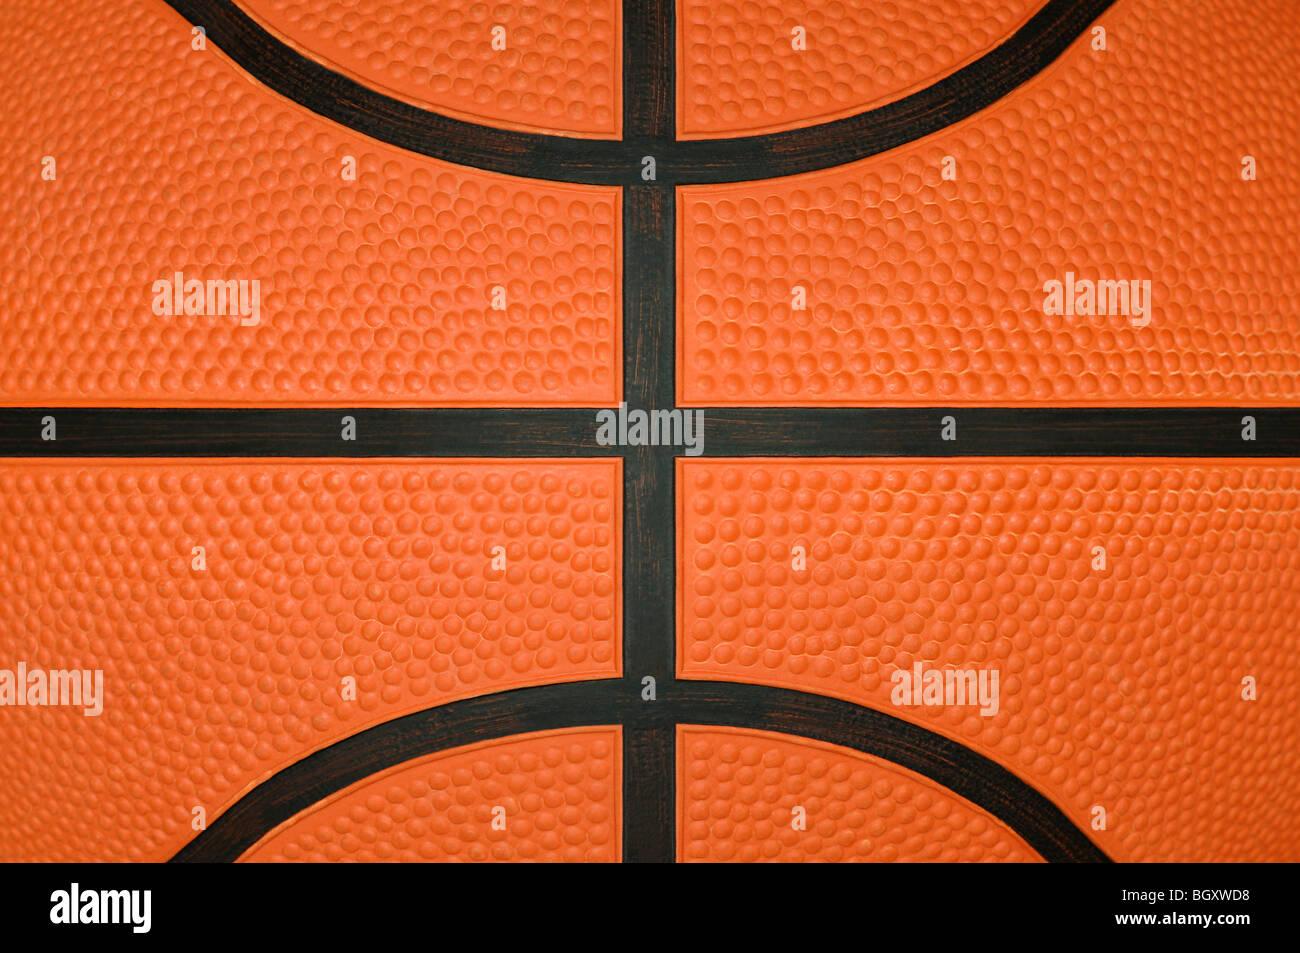 Cerca de baloncesto Imagen De Stock